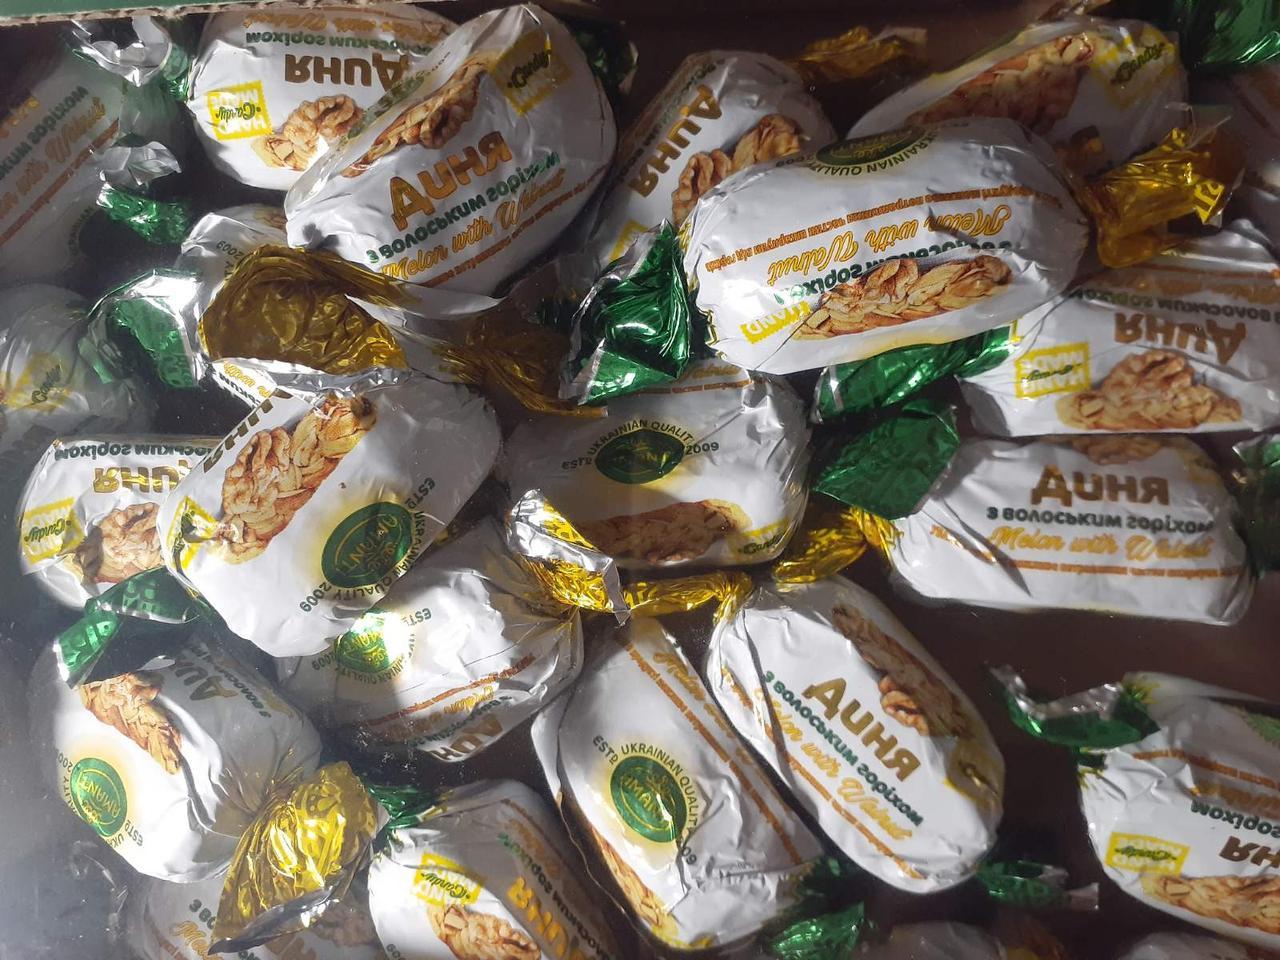 Дыня с грецким орехом в шоколаде  1 кг